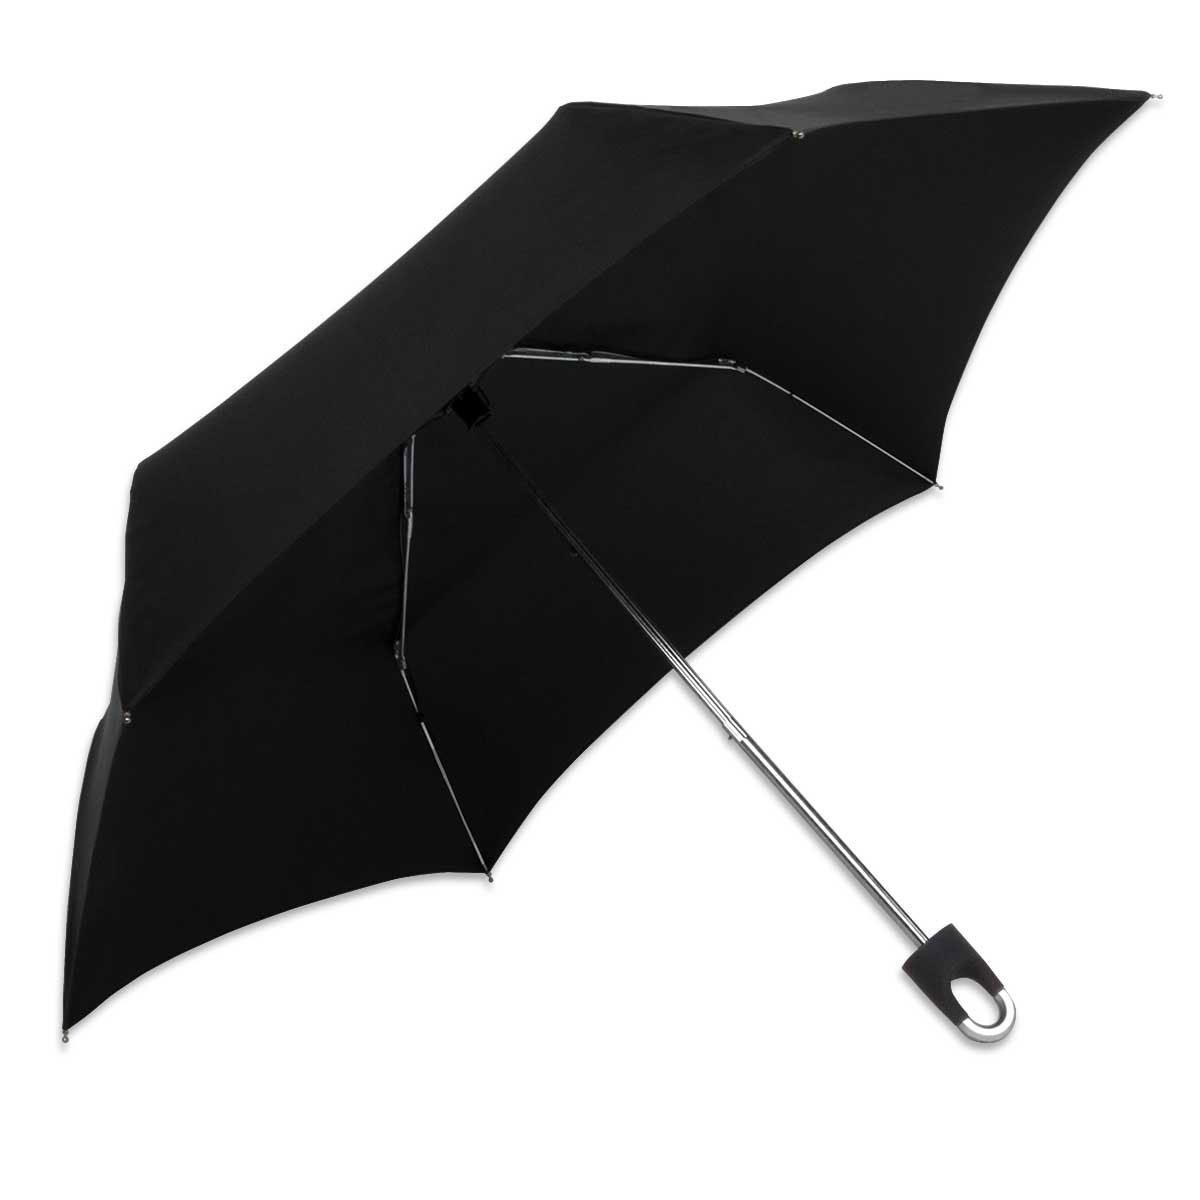 ShedRain Carabiner Clip Handle Compact Manual Umbrella: Black